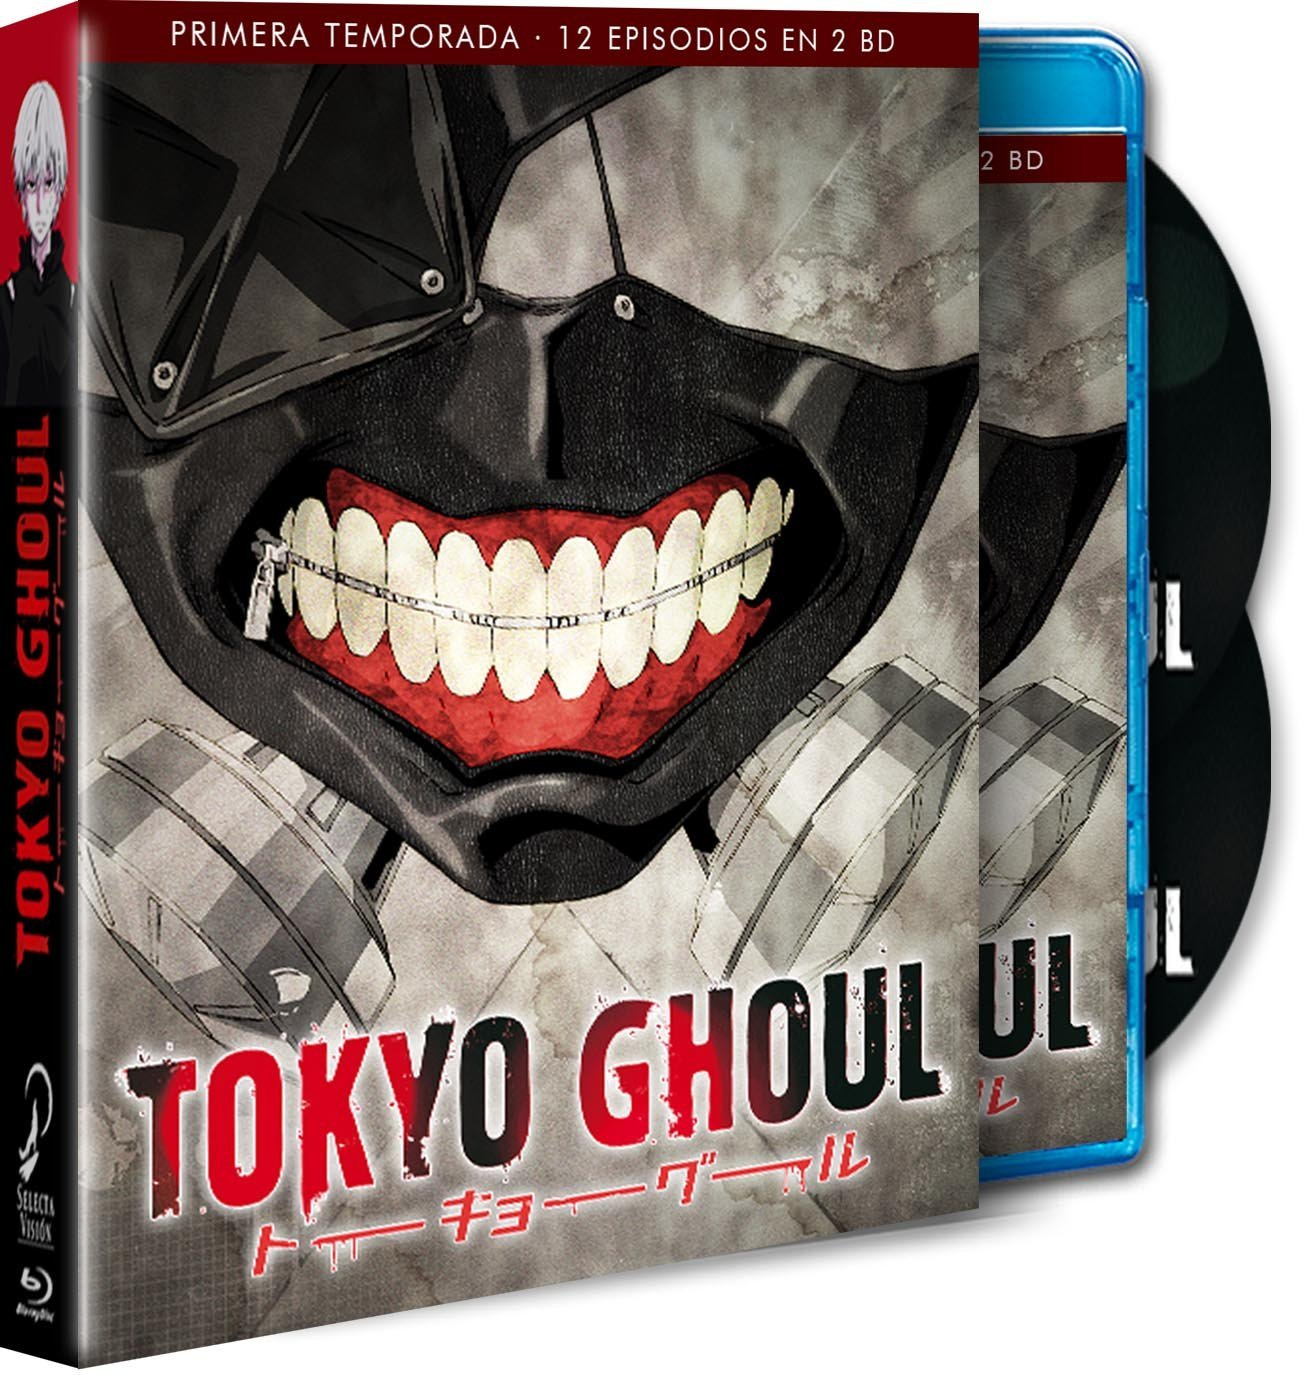 Tokyo Ghoul BD Eco